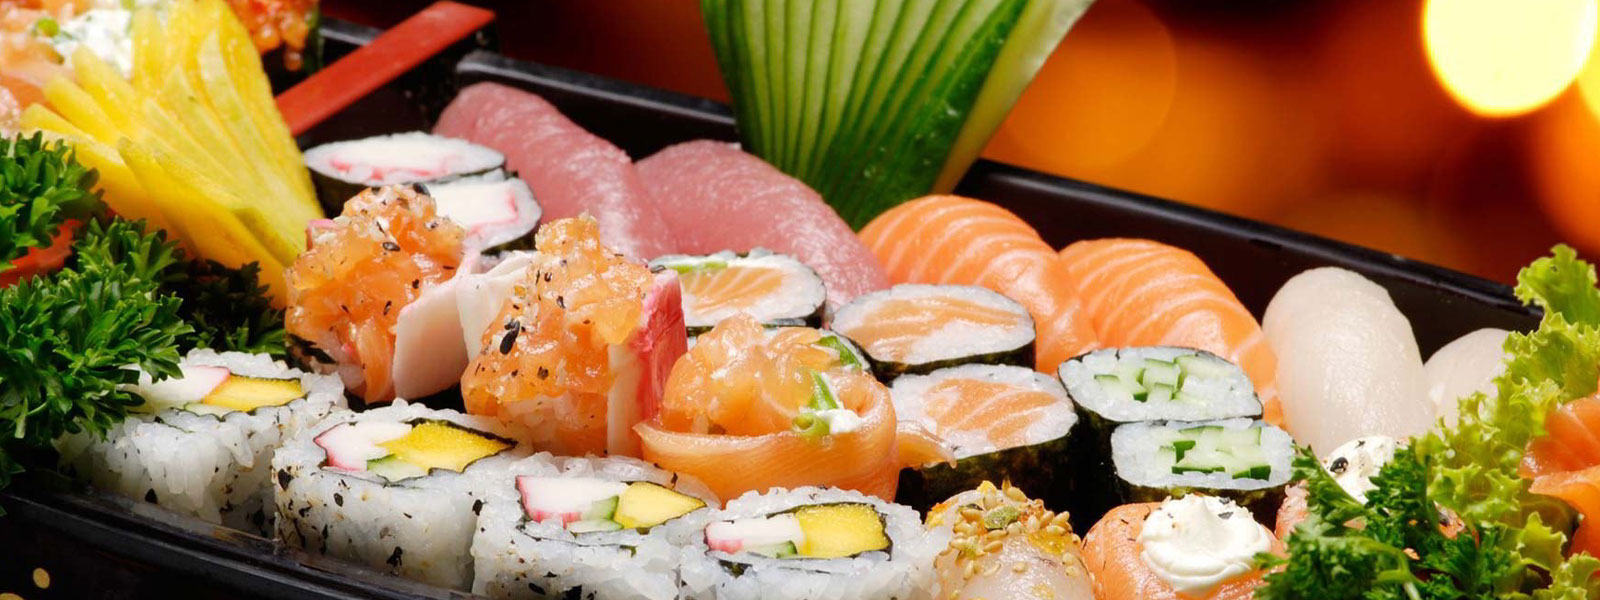 Може ли да се яде суши при диети